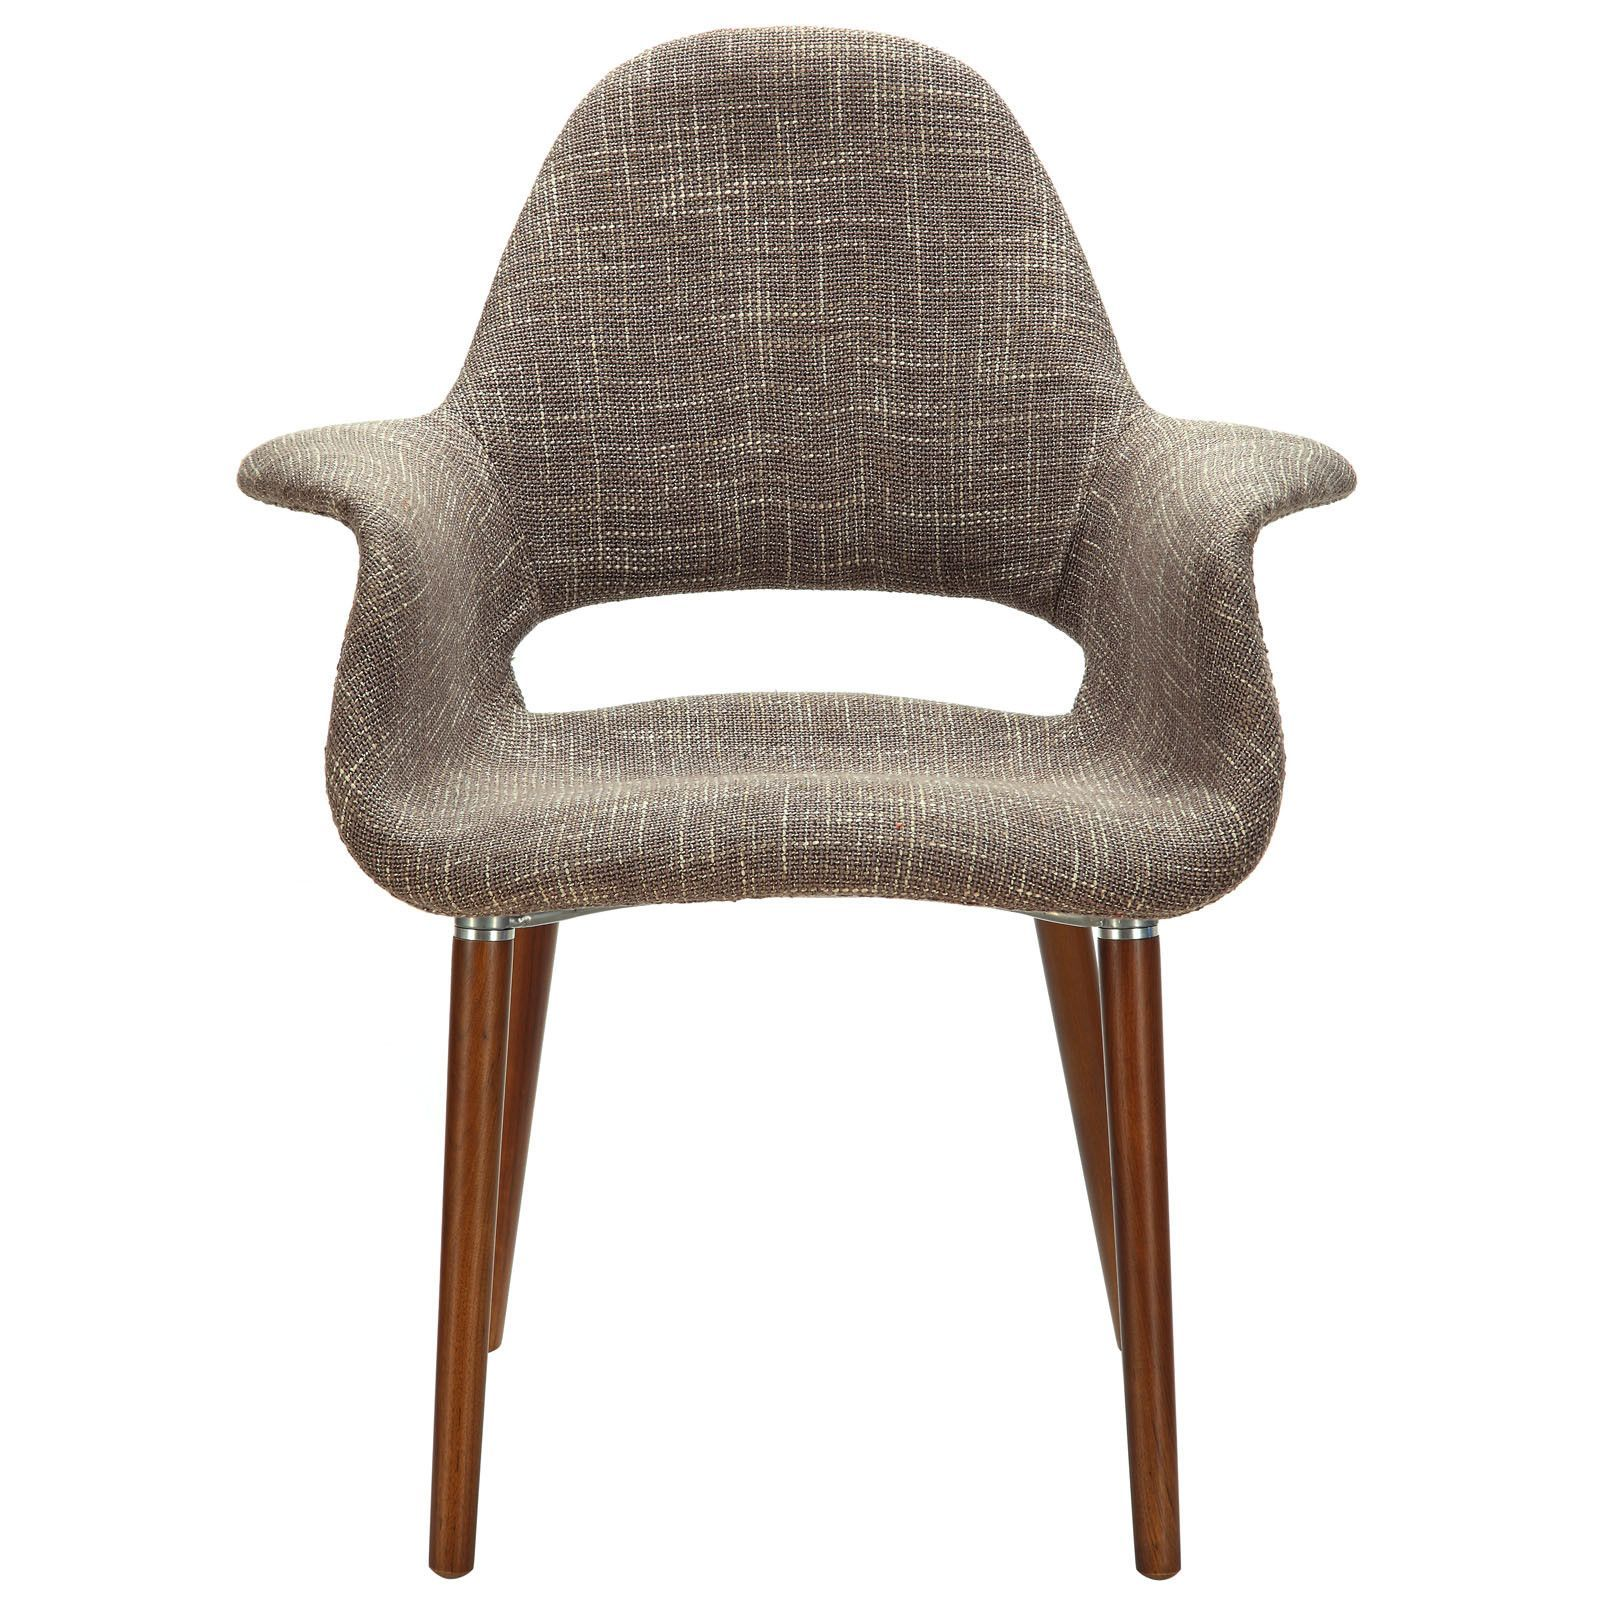 Saarinen Organic Chair Reproduction Mid Century Modern Dining